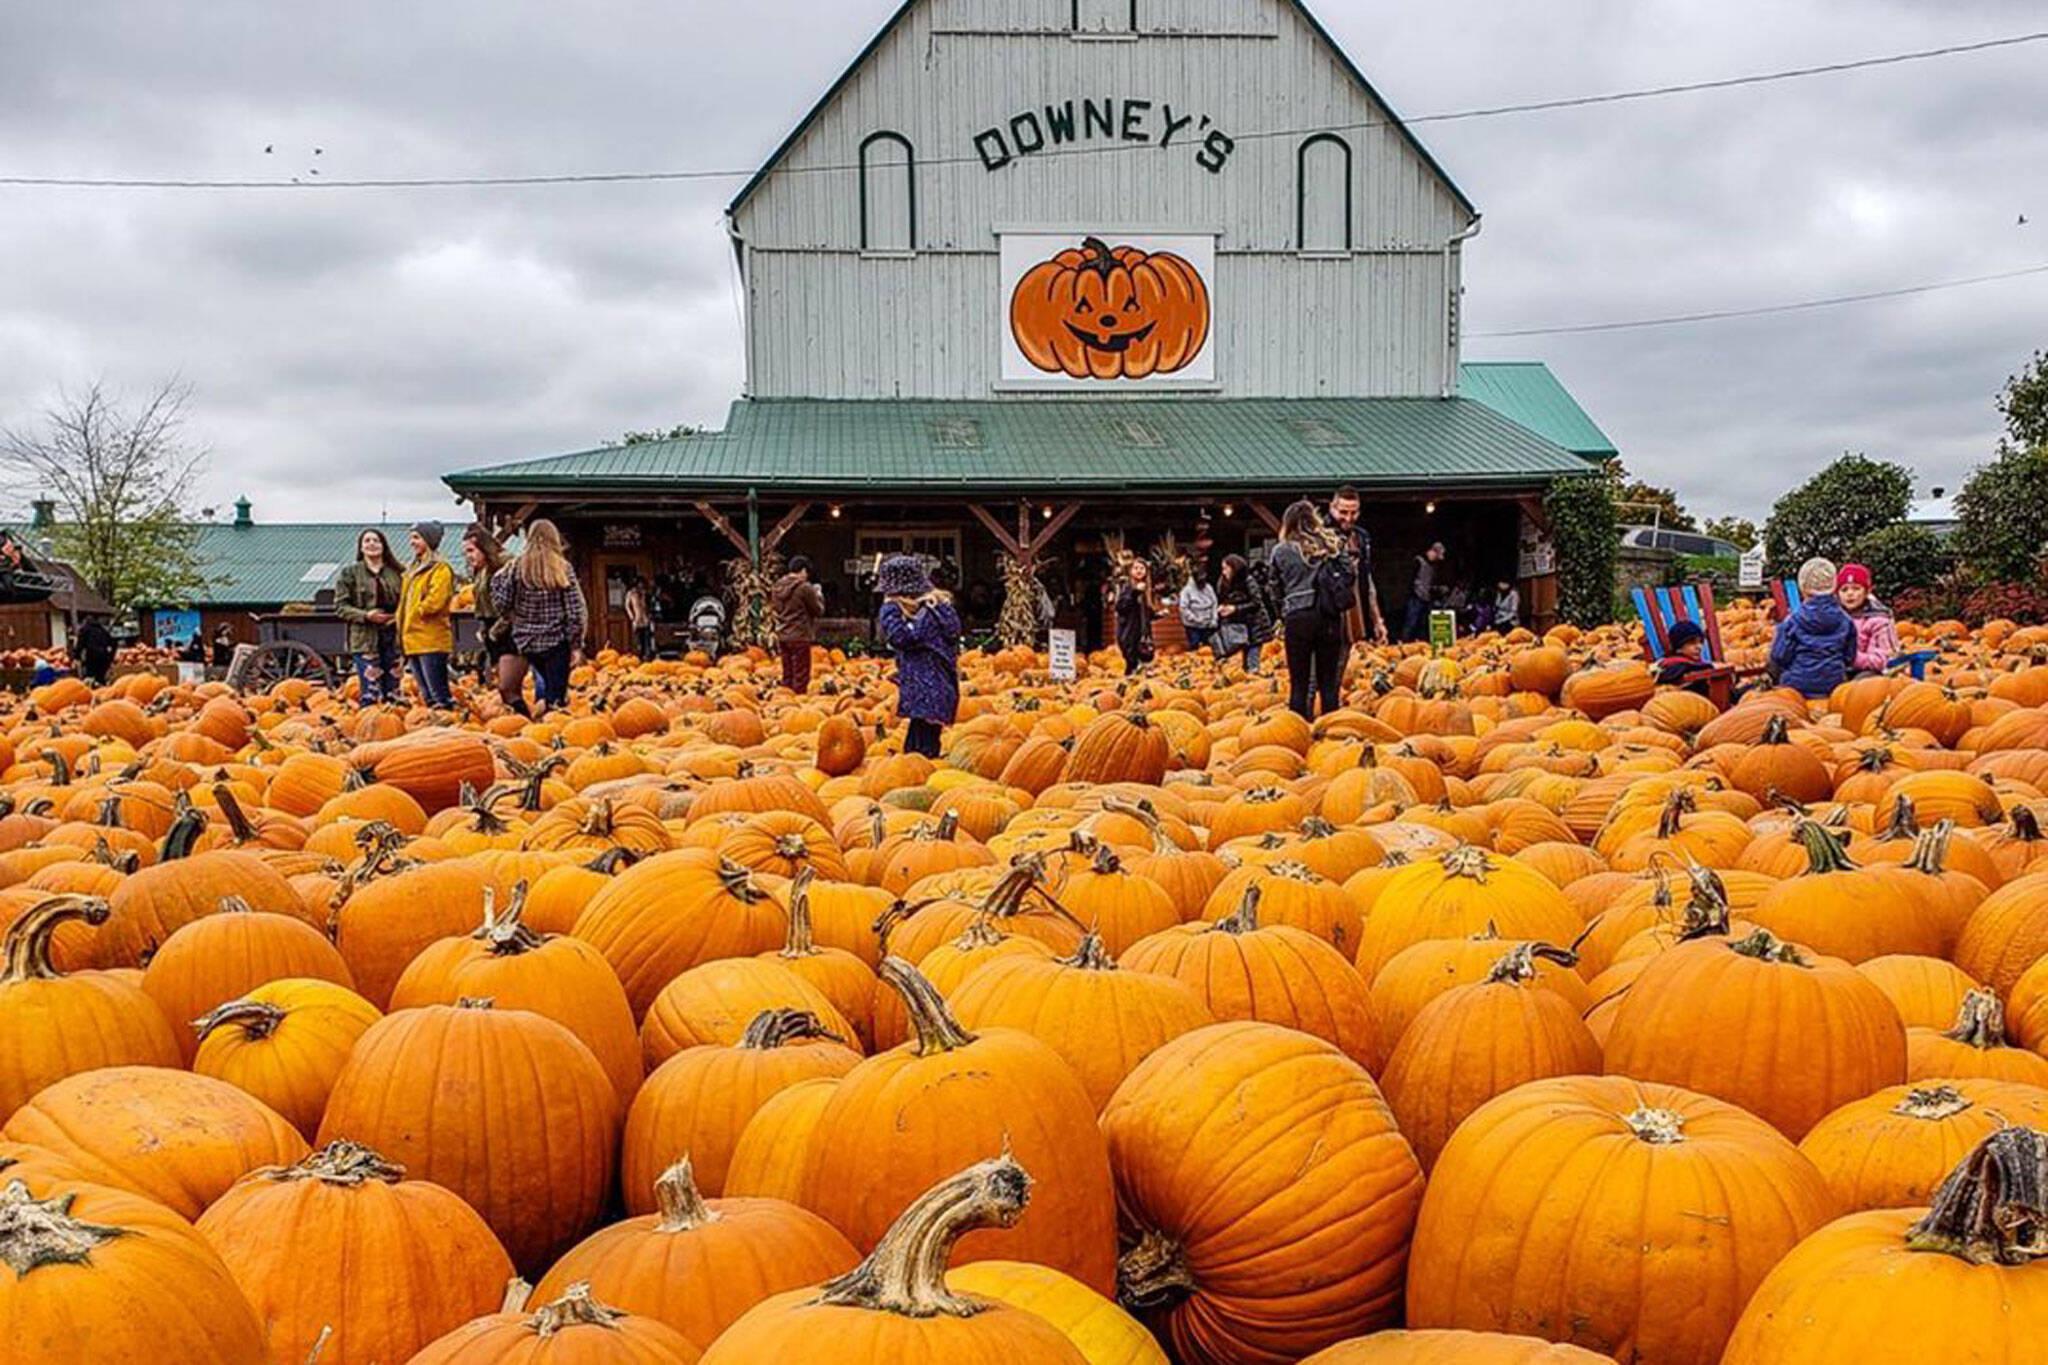 downeys pumpkin farm